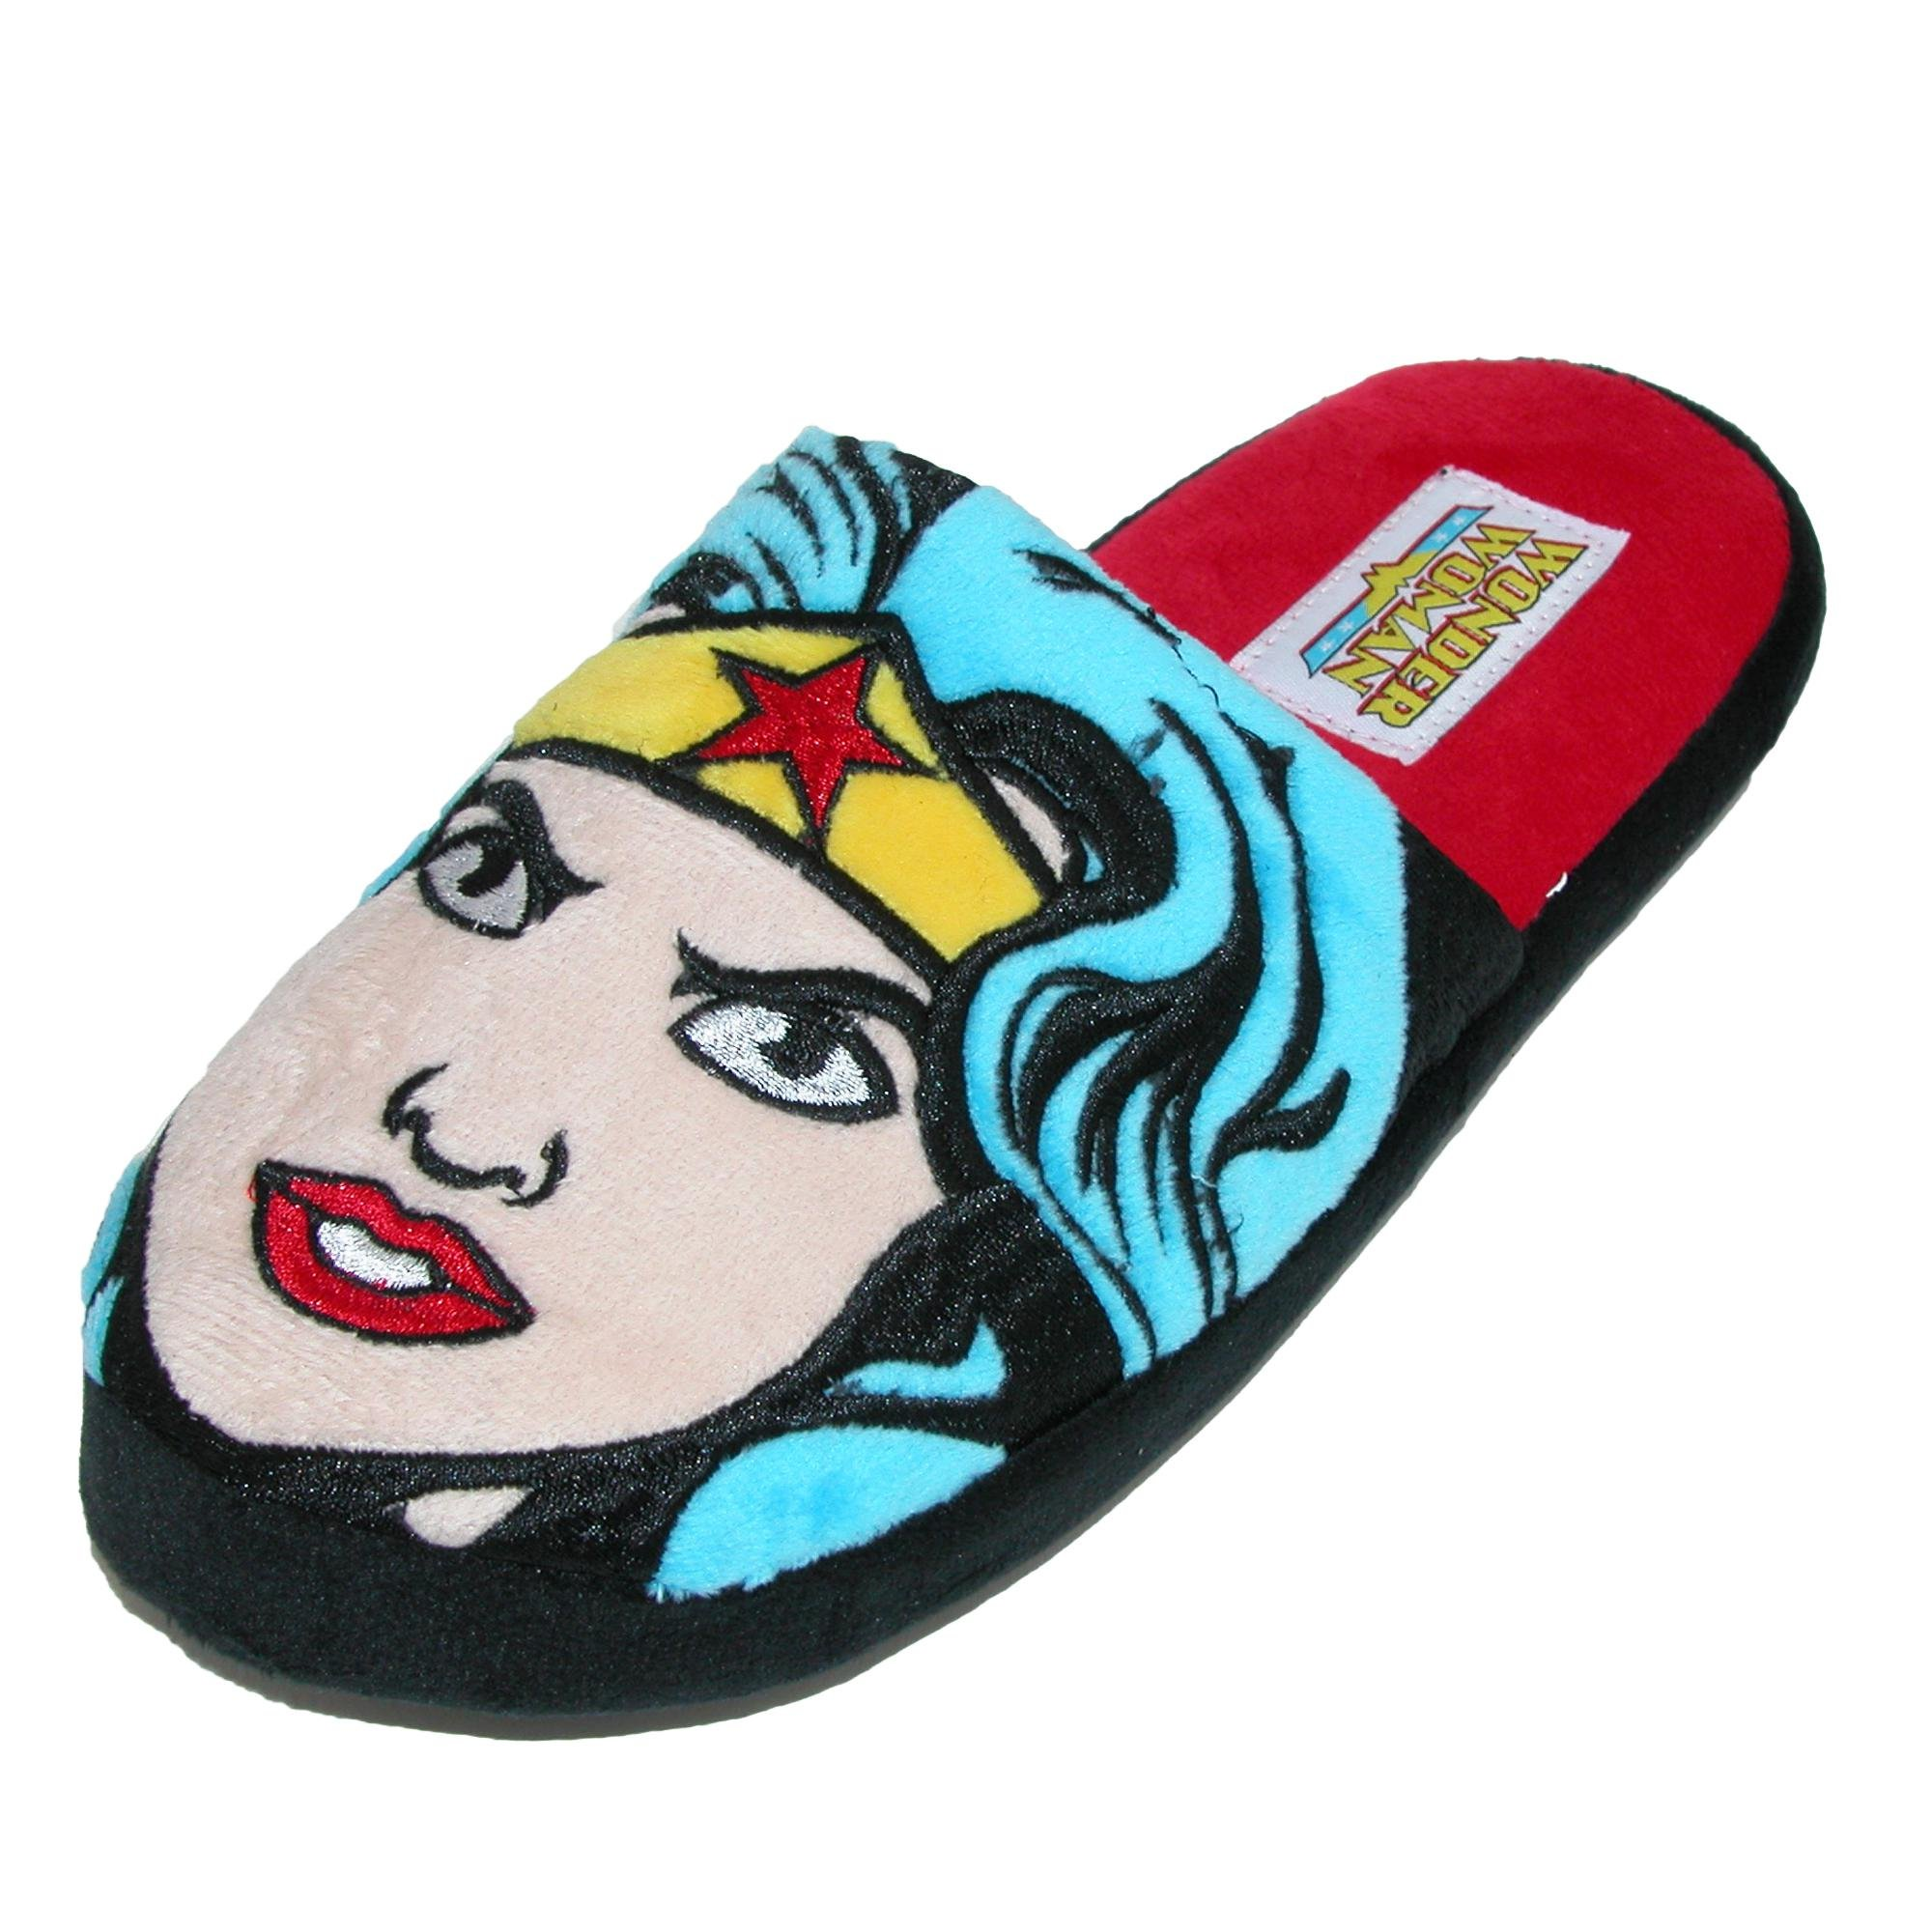 Bioworld Women's DC Comics Wonder Woman Novelty Slide Slippers, Large (9/10)